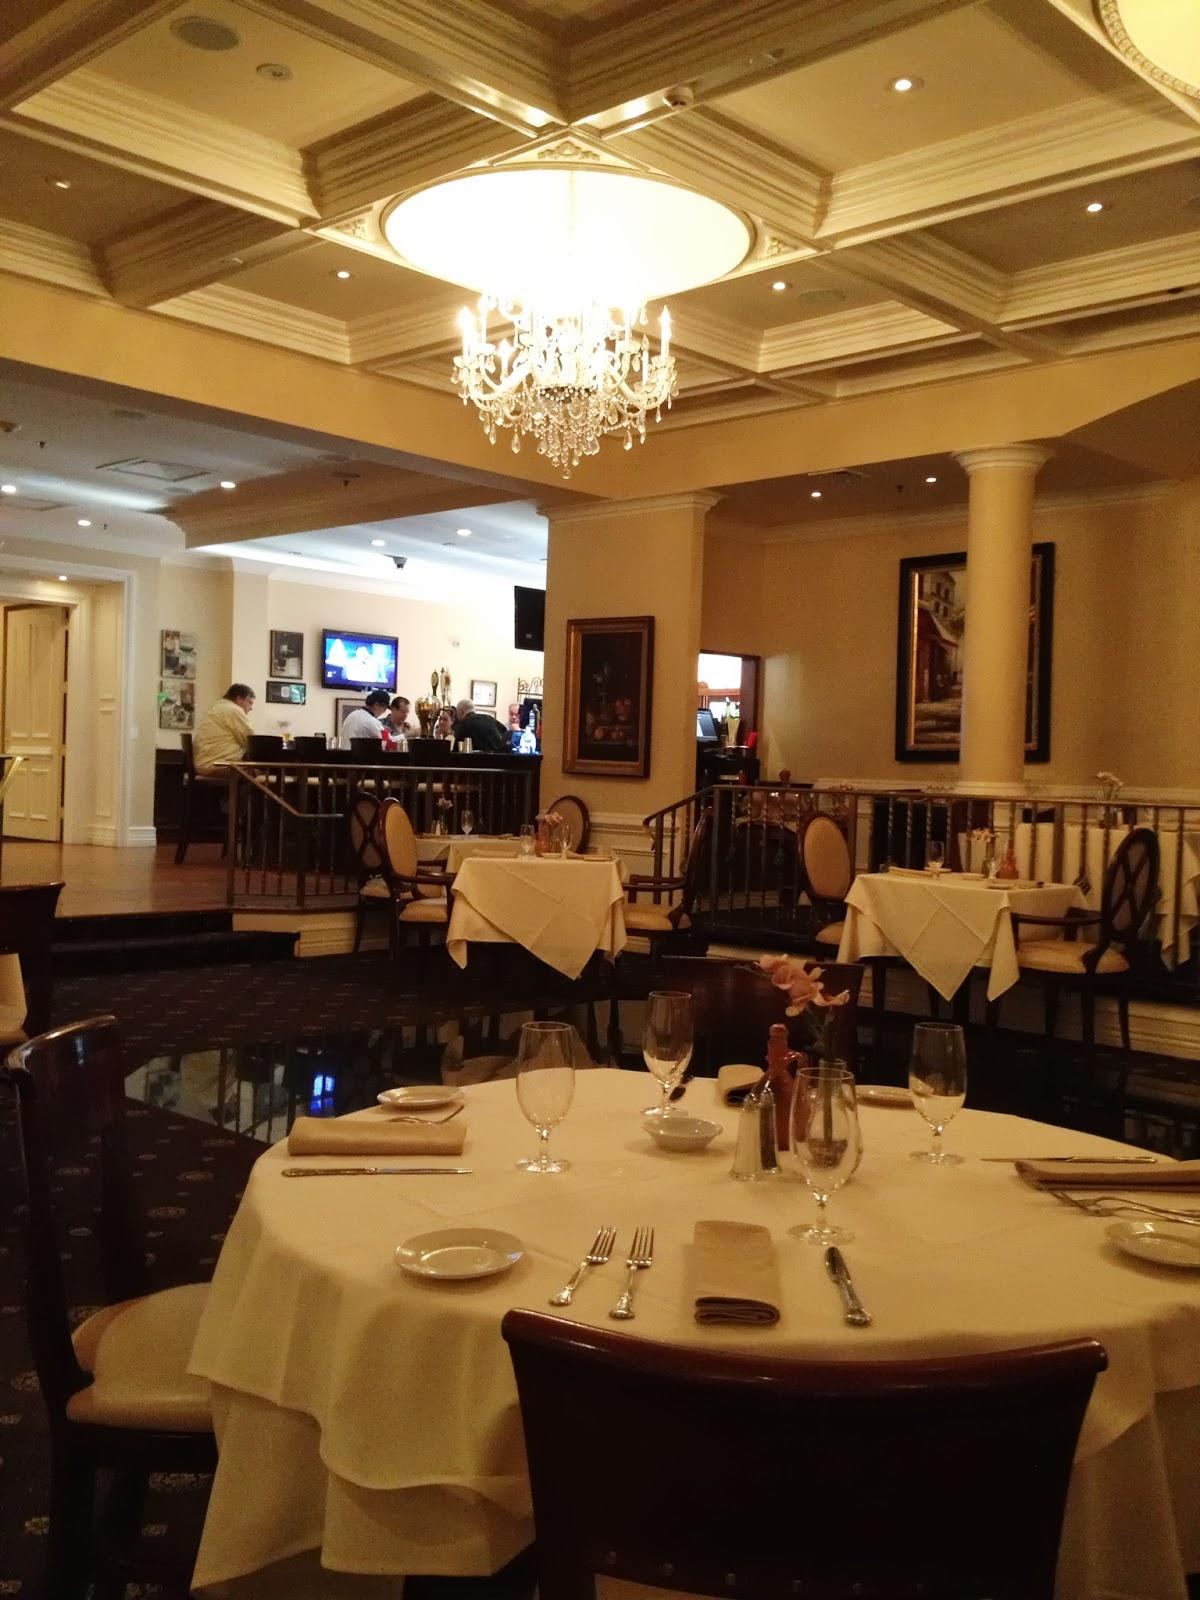 bel posto restaurant in hackensack nj